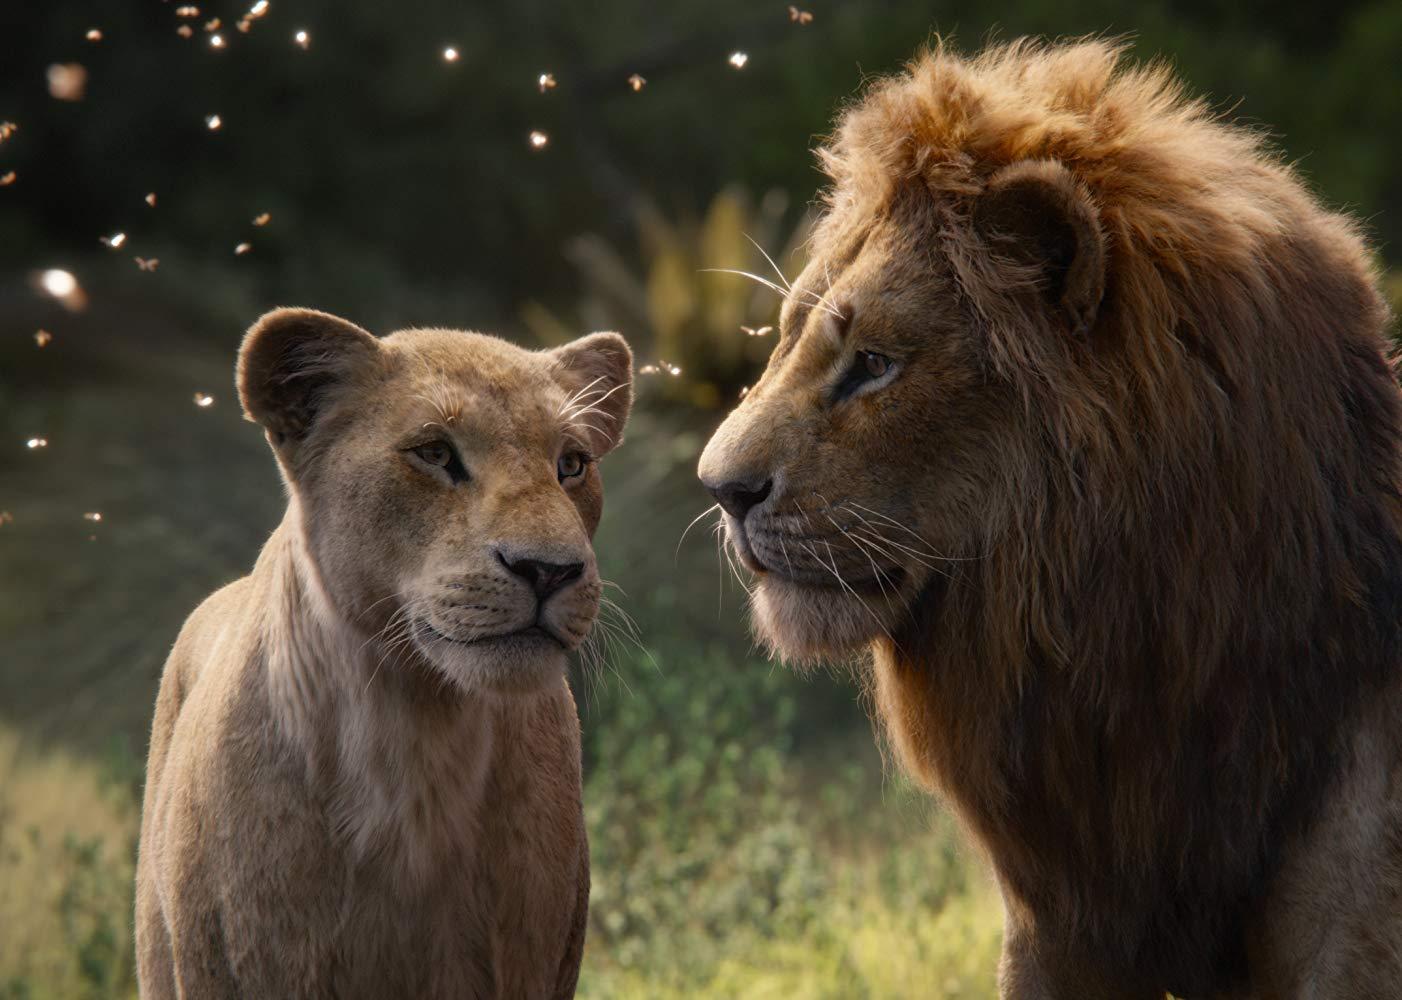 http://www.thecinemen.com/wp-content/uploads/2019/07/Lion-King-2-.jpg